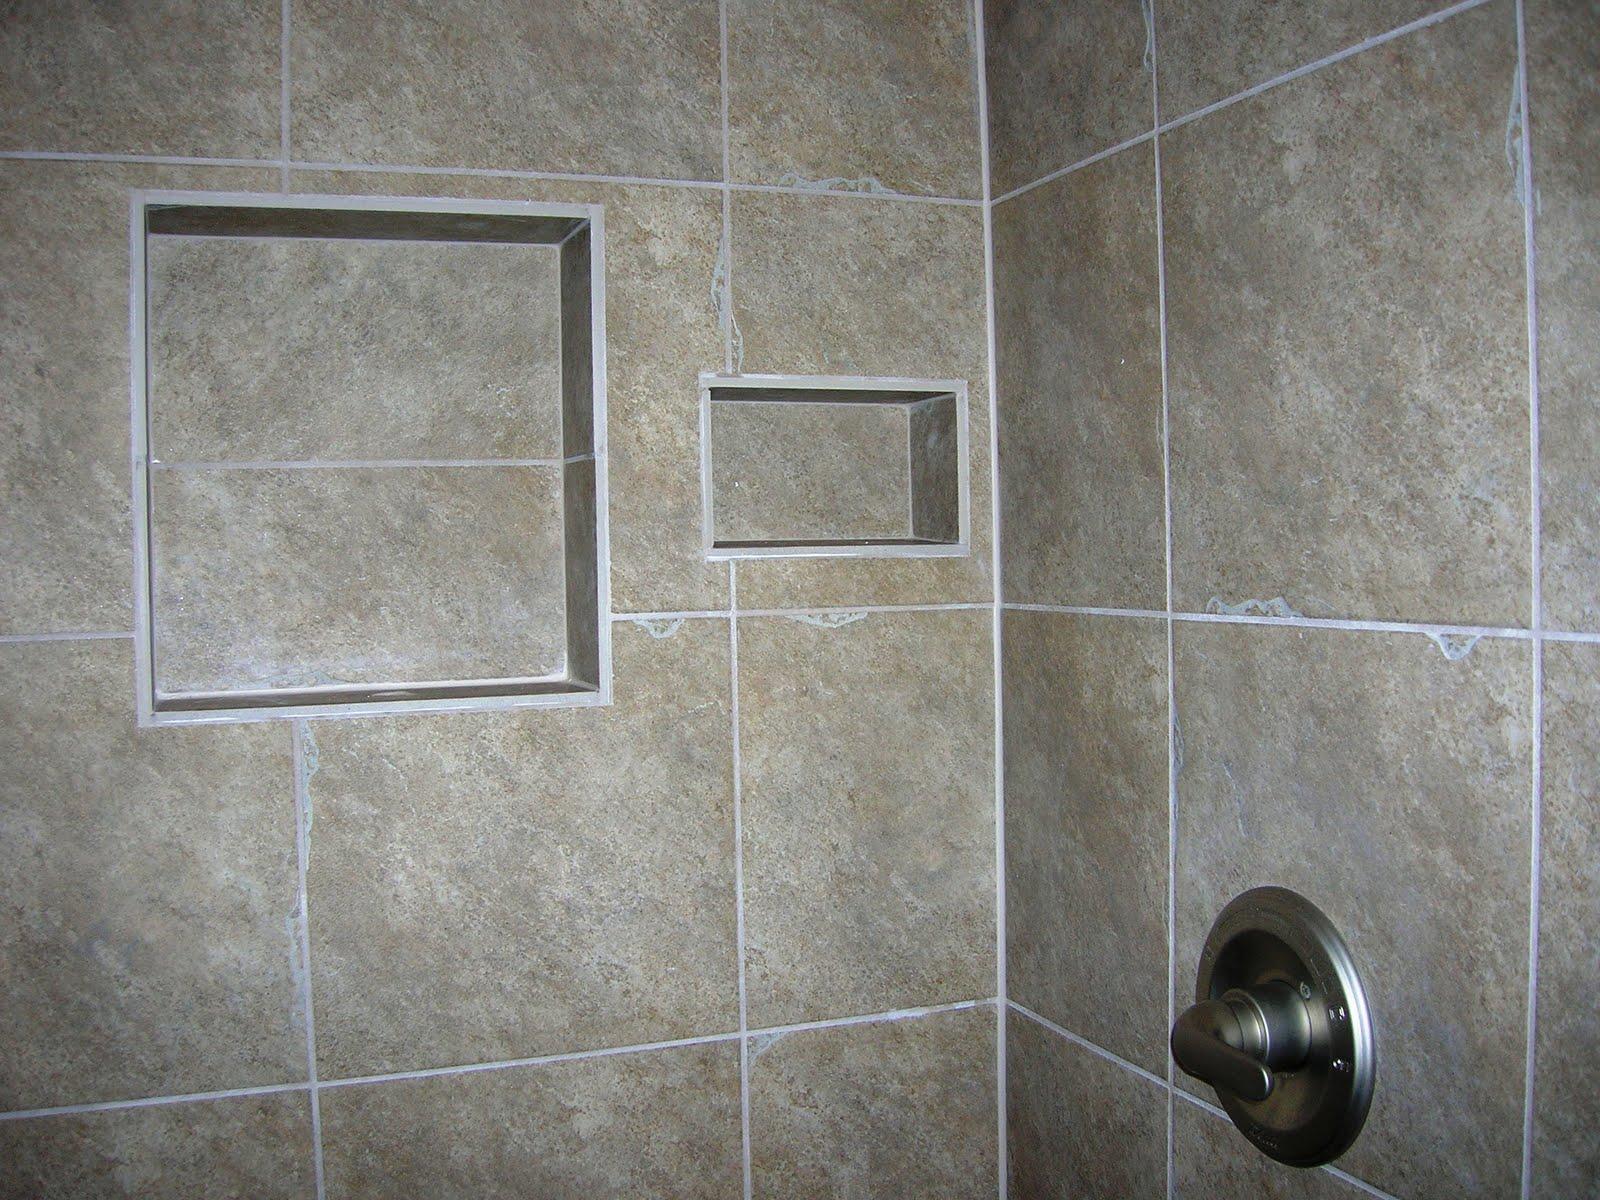 bathroom-bathroom-tile-shower-ideas-pictures-tile-shower-ideas-tile-installation-porcelain-tile-astounding-small-tile-shower-ideas-vintage-bathroom-tile-patterns-ideas